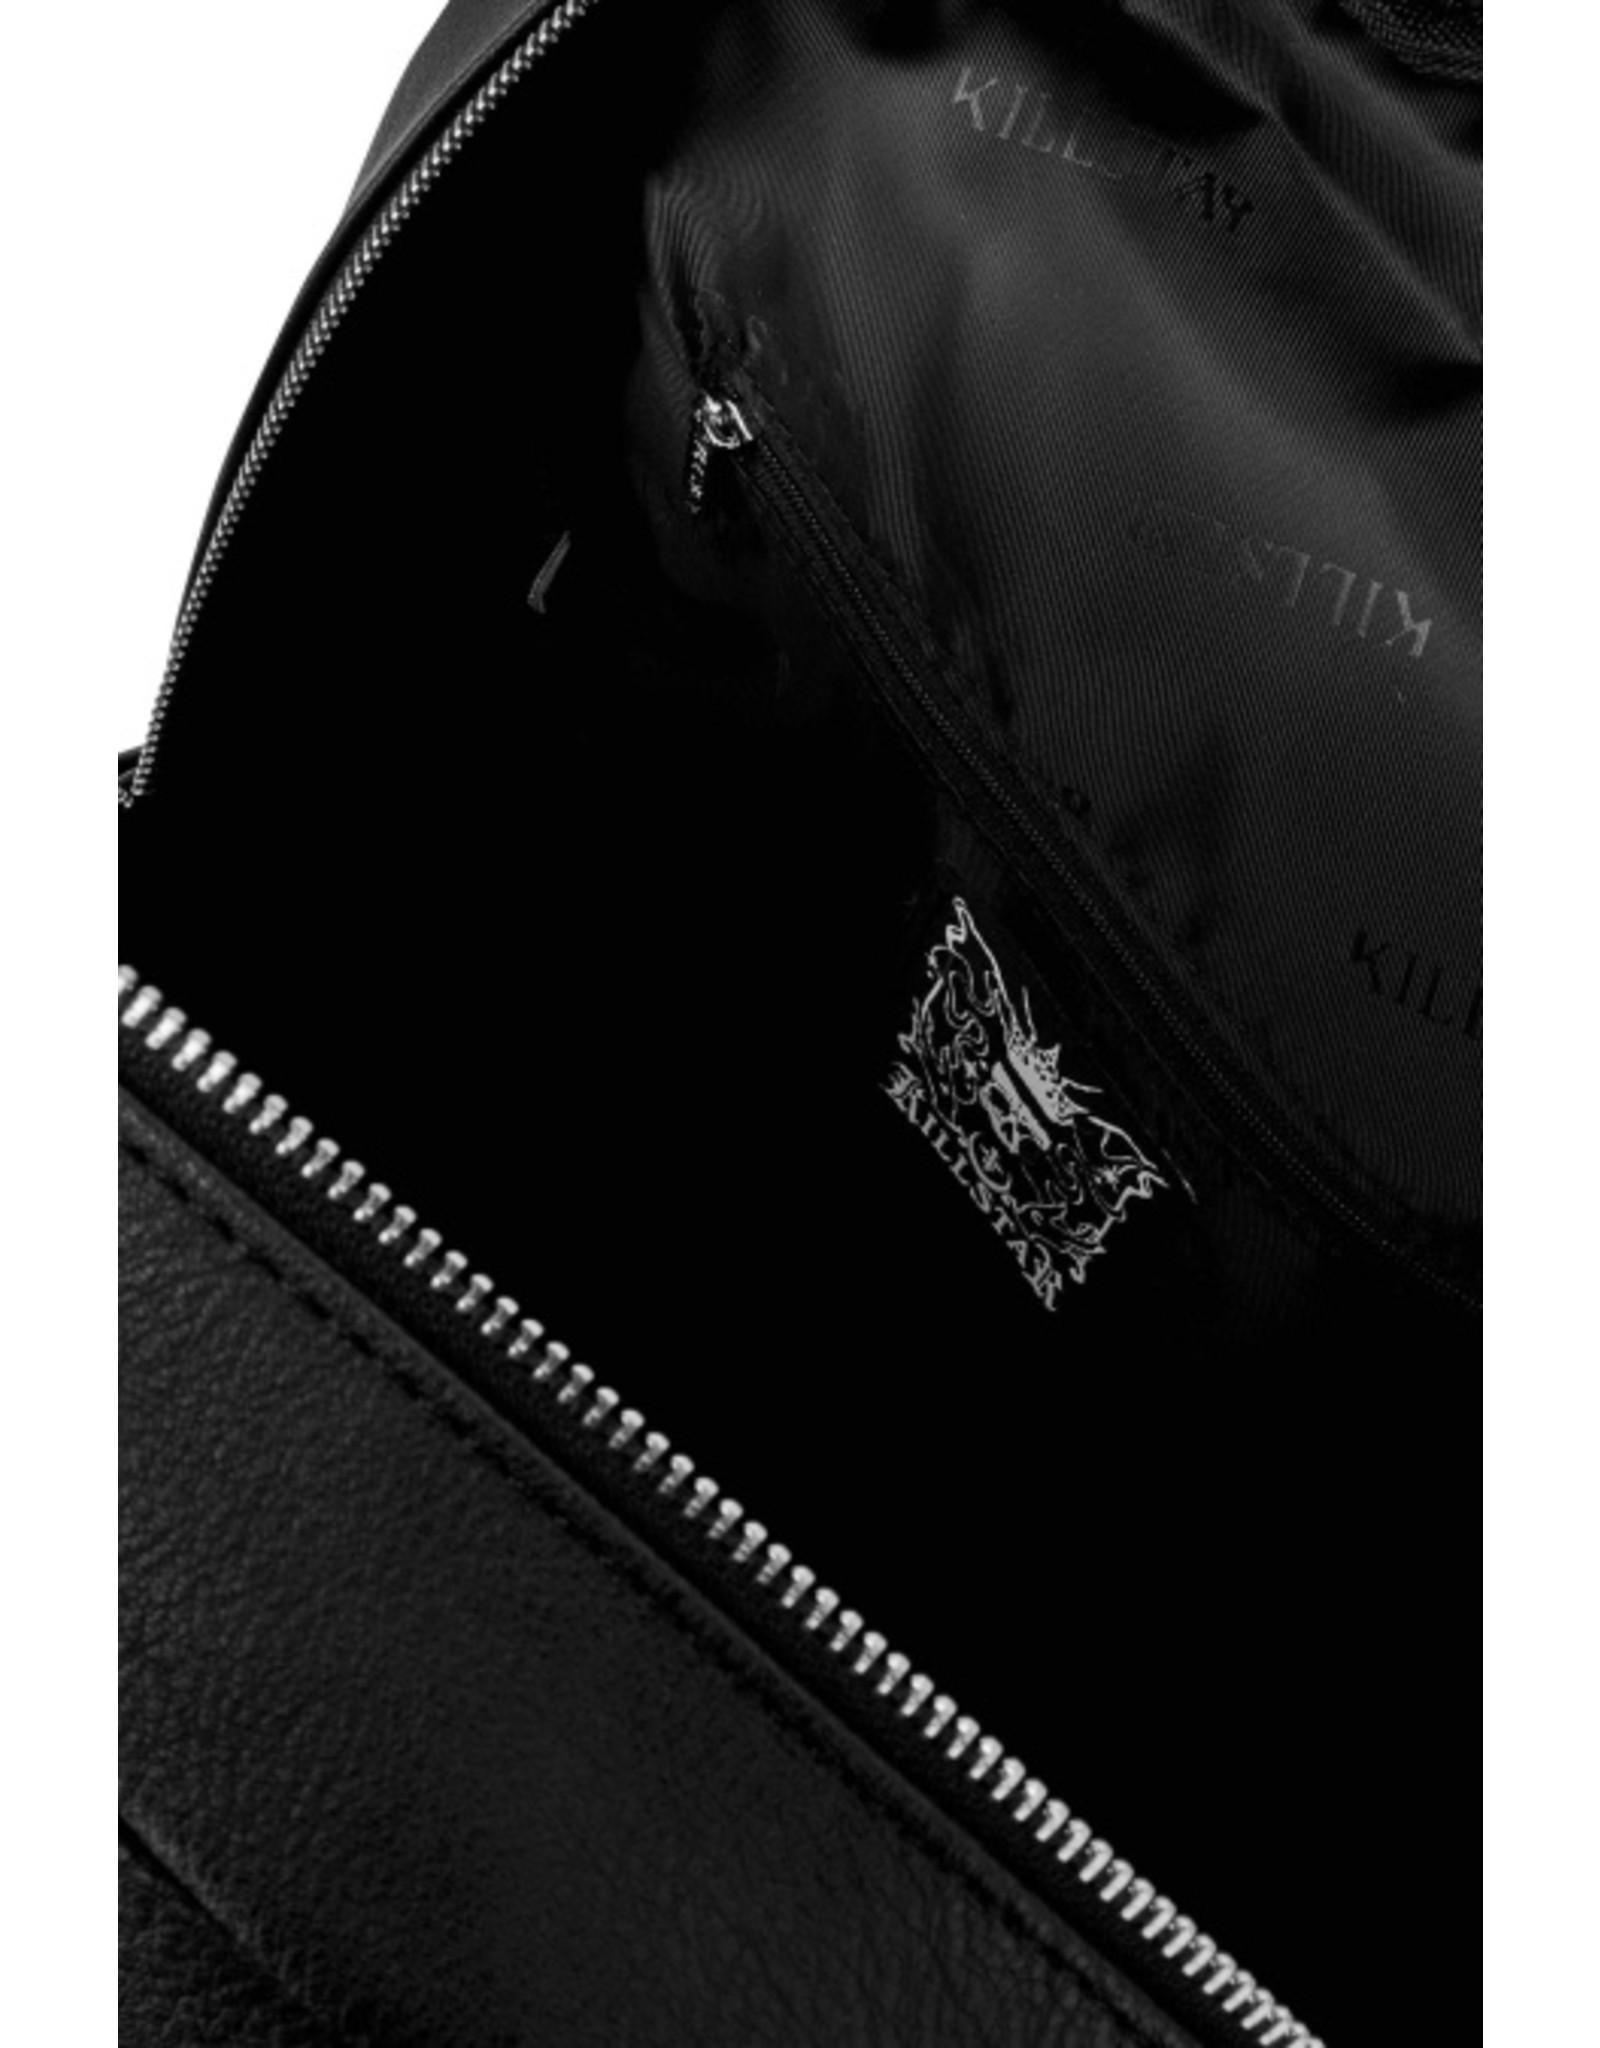 Killstar Killstar bags and accessories - Killstar Baphomet backpack Brimstone